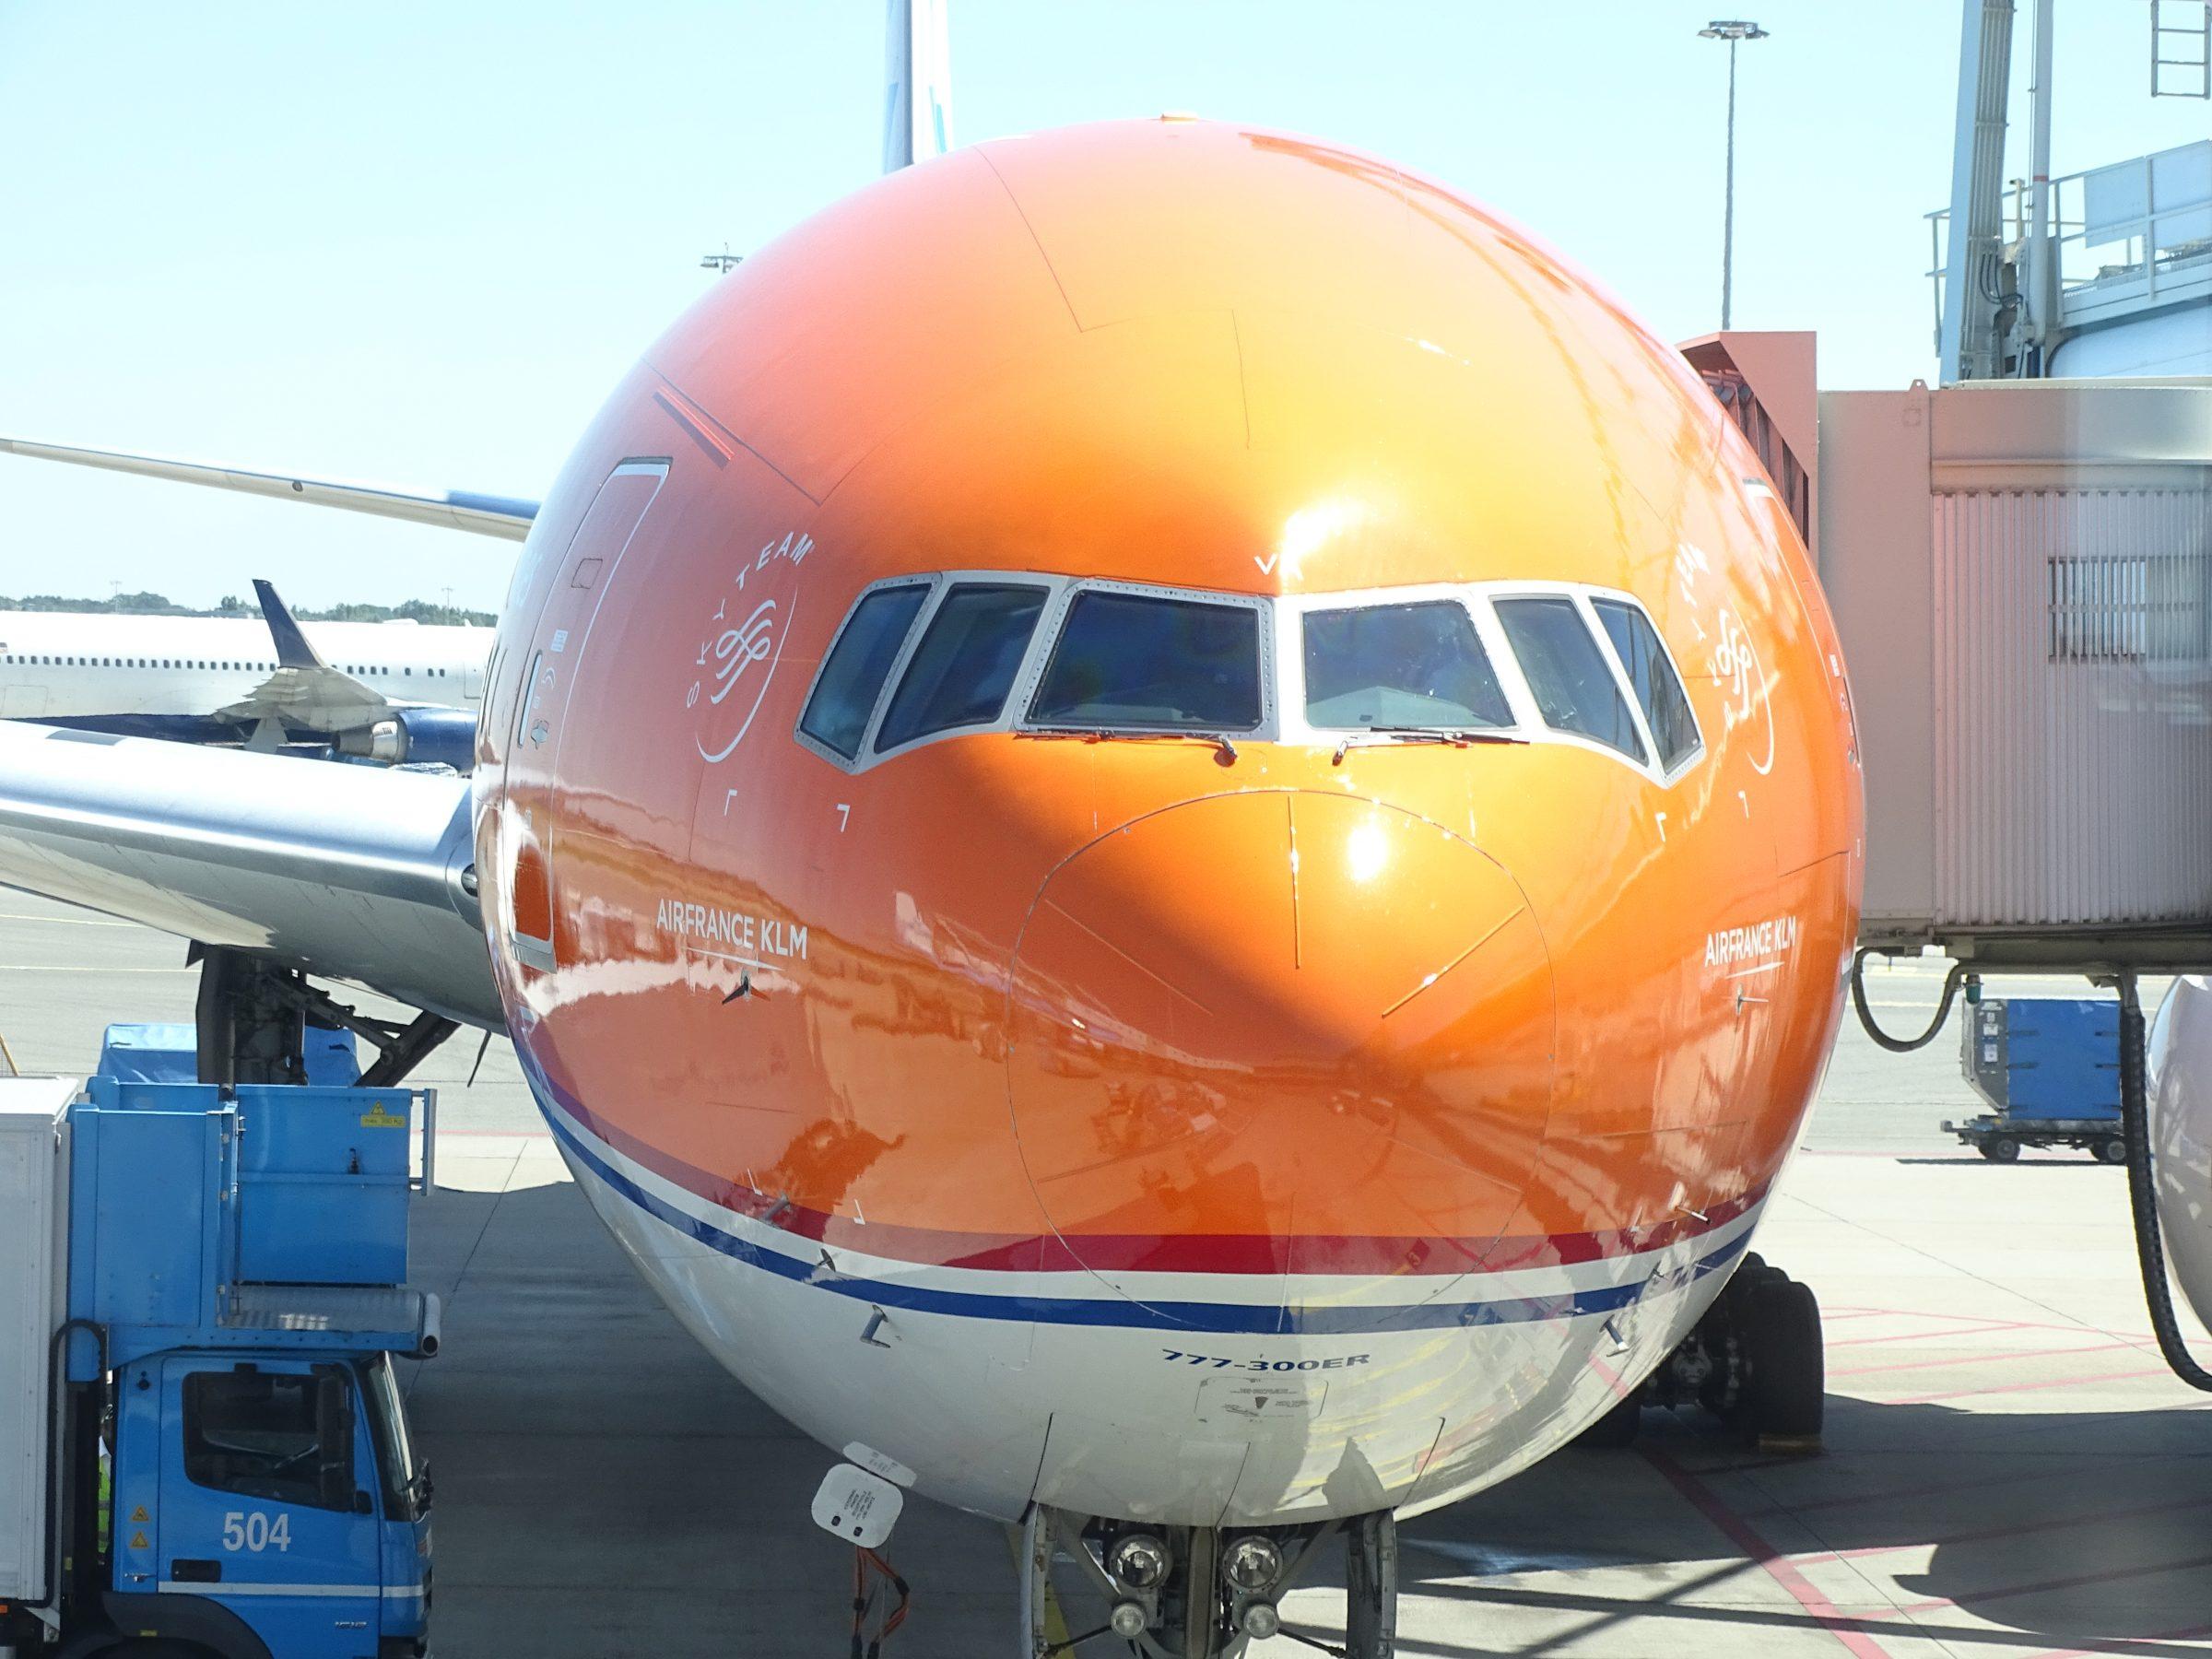 KLM Orange 777